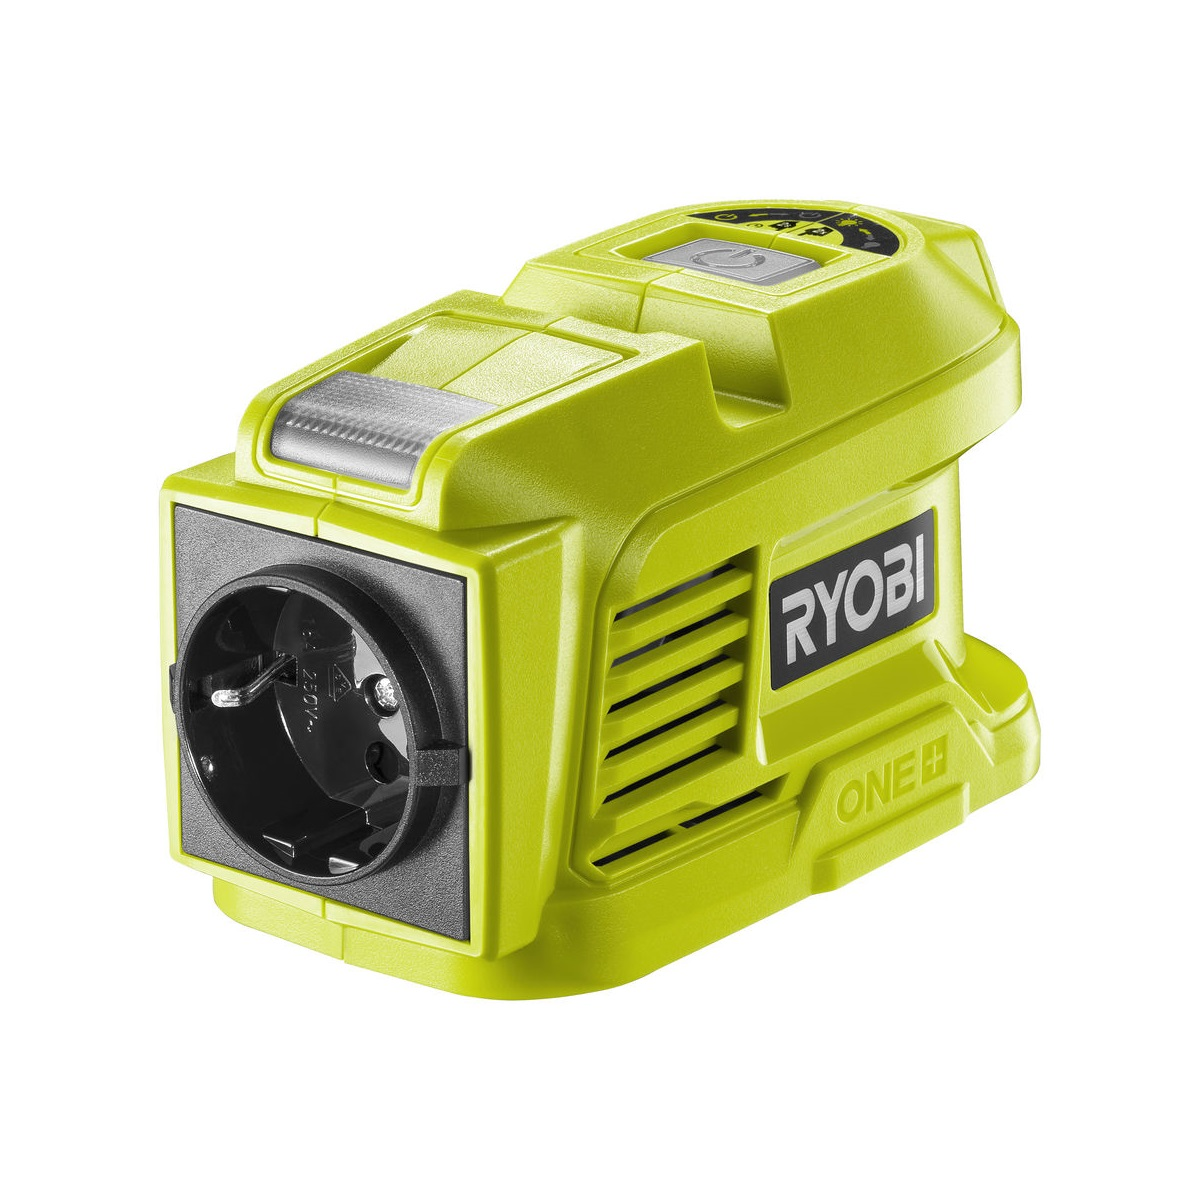 Ryobi RY18BI150A-0, aku měnič napětí (bez baterie a nabíječky)